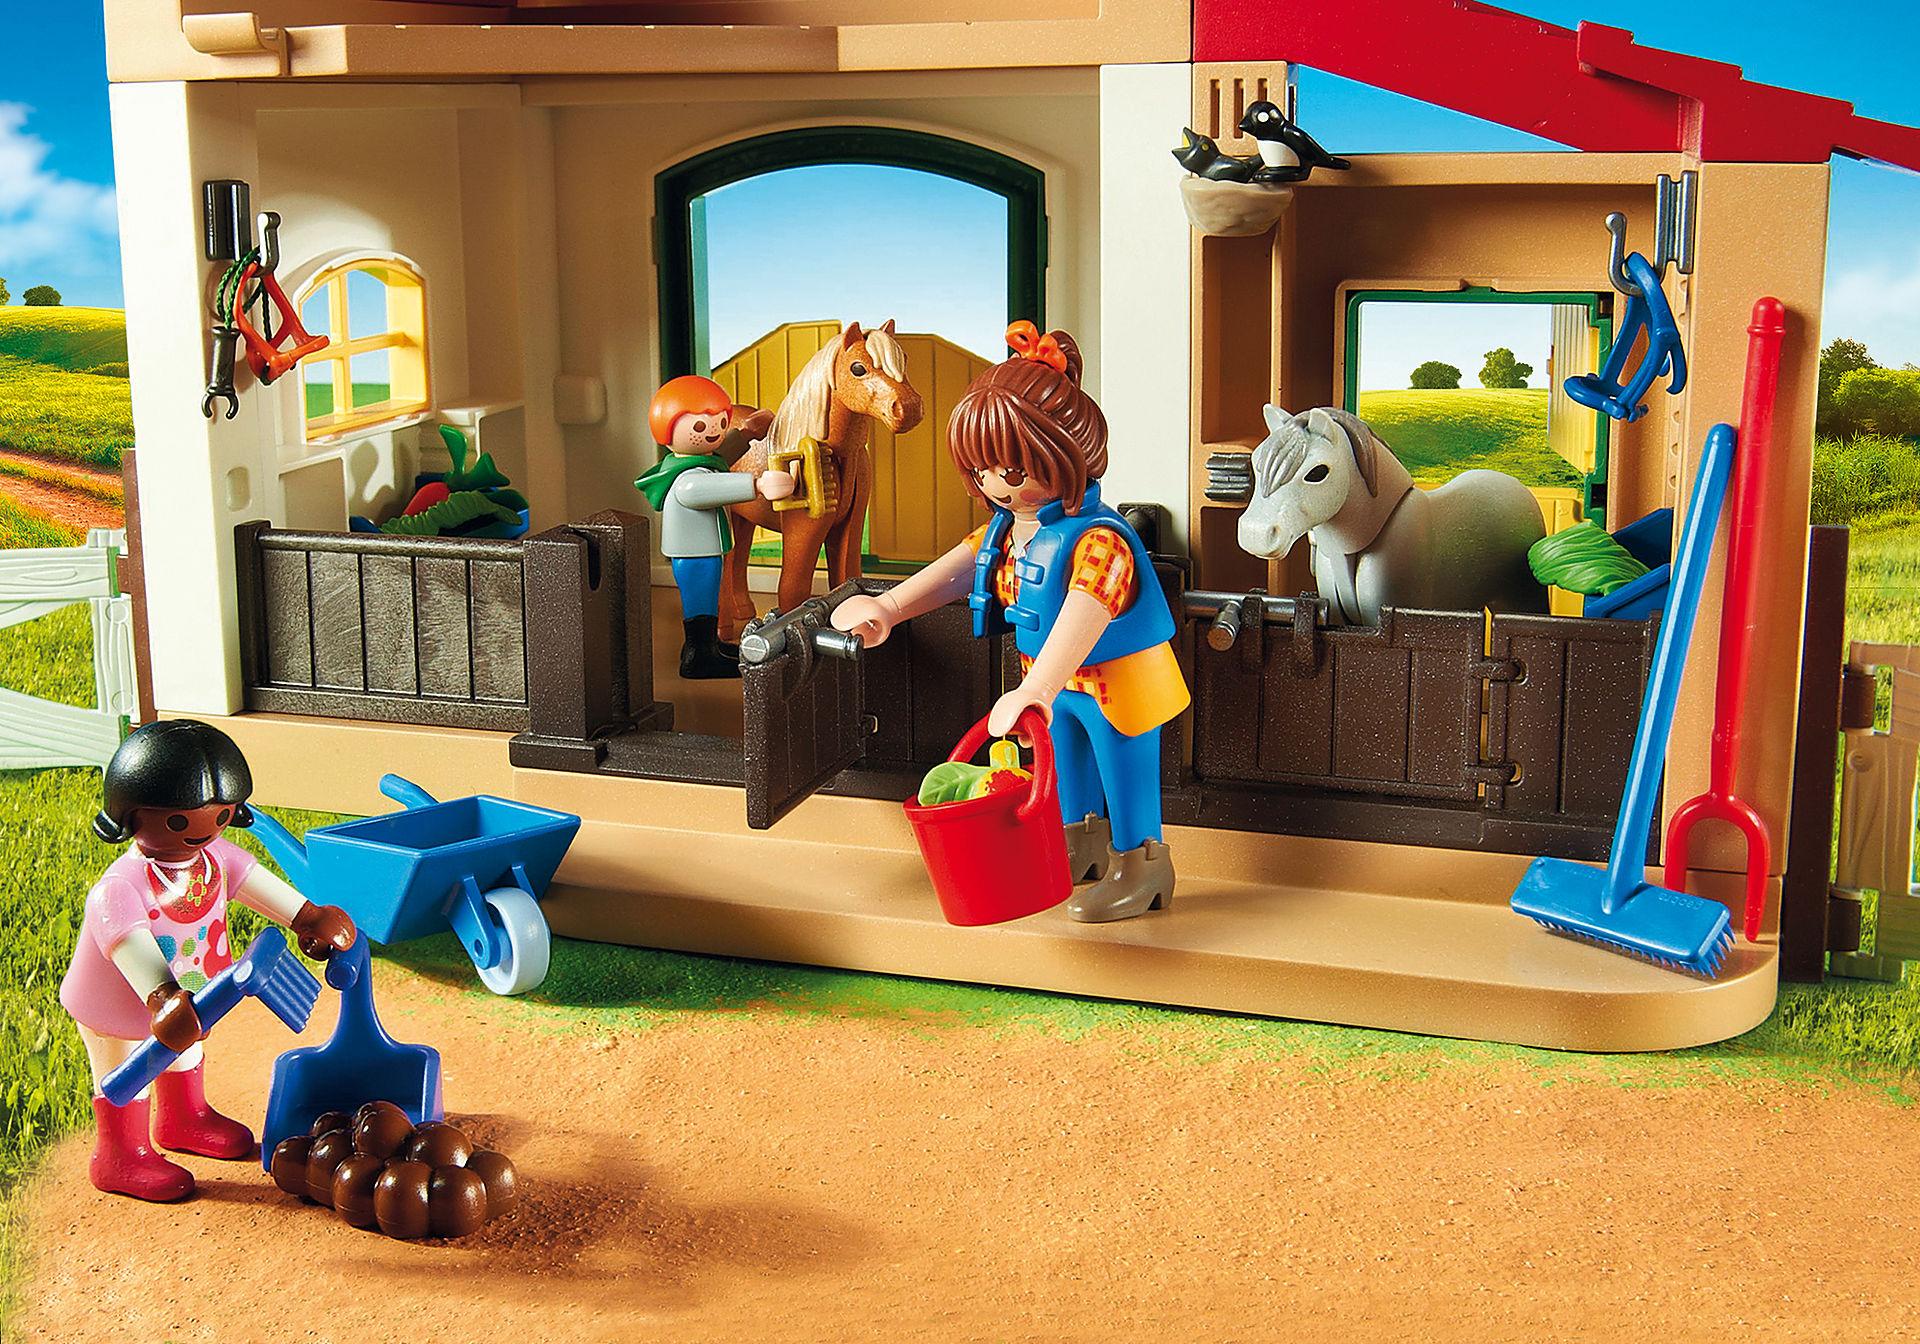 http://media.playmobil.com/i/playmobil/6927_product_extra3/Ponypark